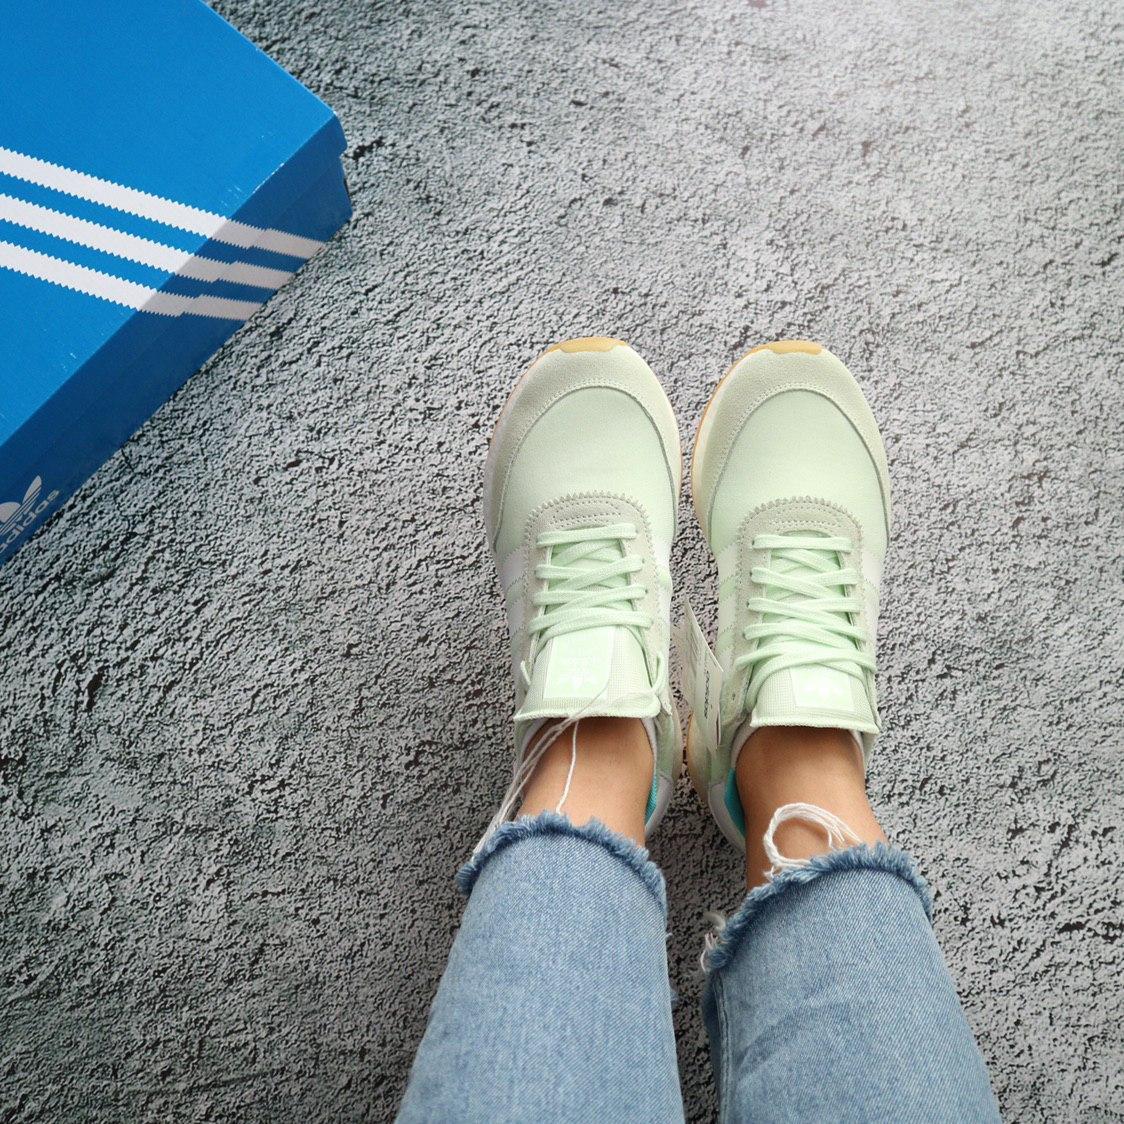 Кроссовки оригинал Adidas I-5923 W CQ2530 37 (24 см)